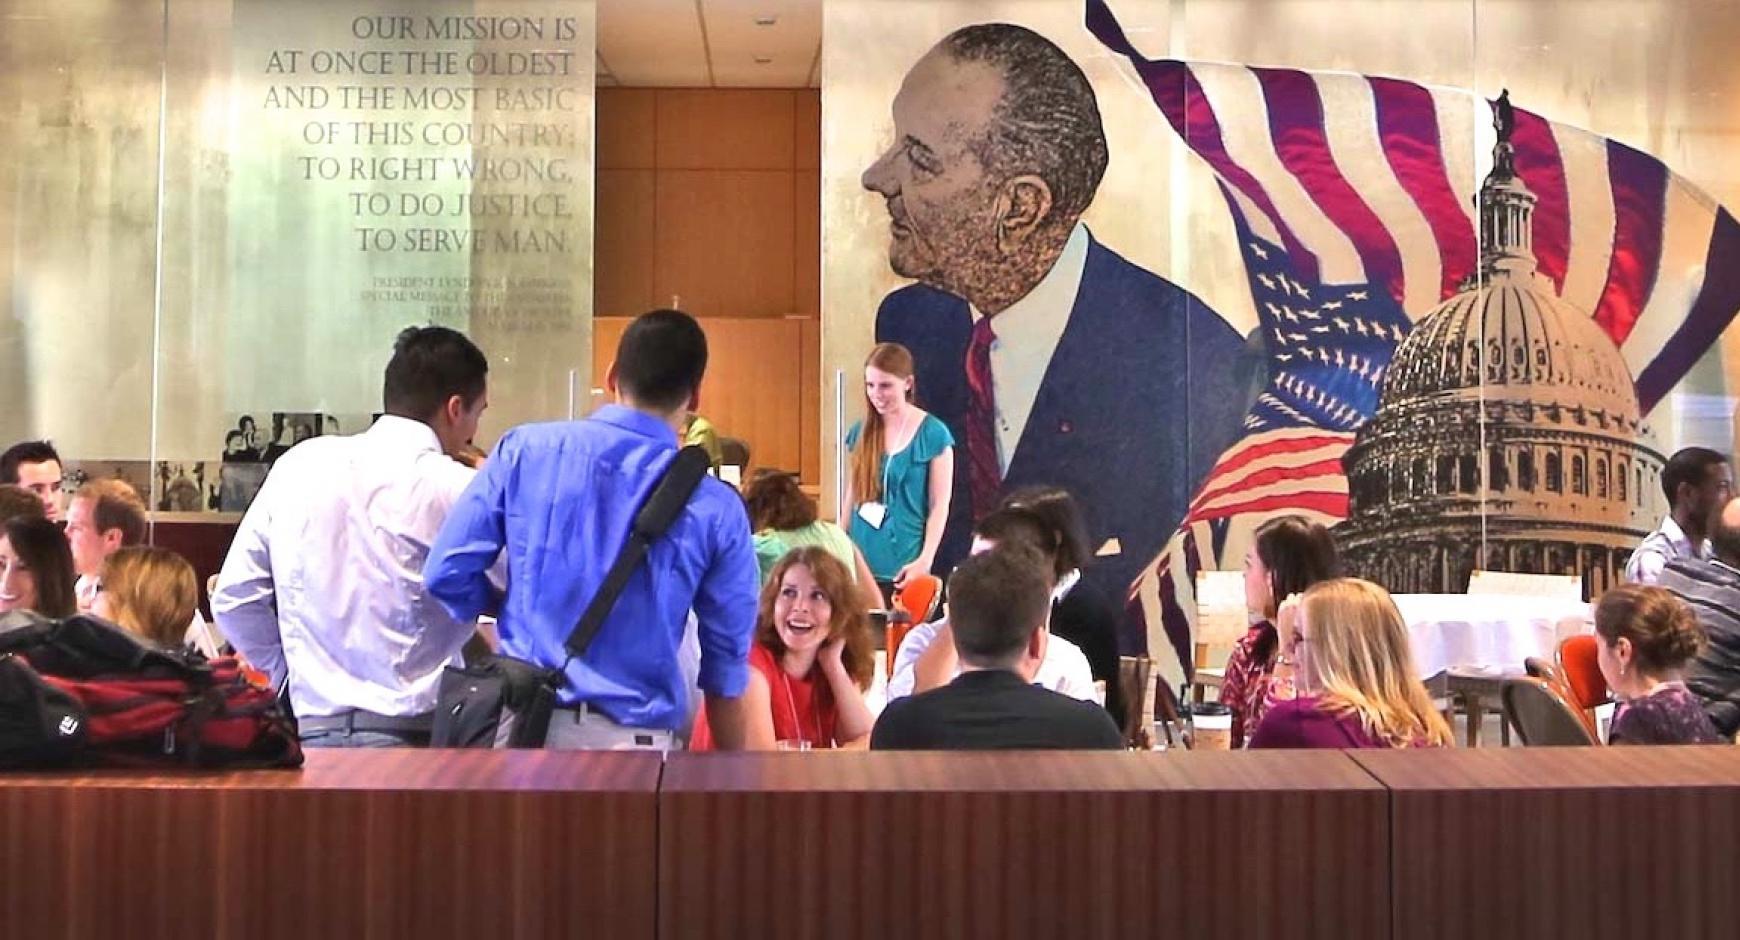 Students mingle inside the LBJ School of Public Affairs.